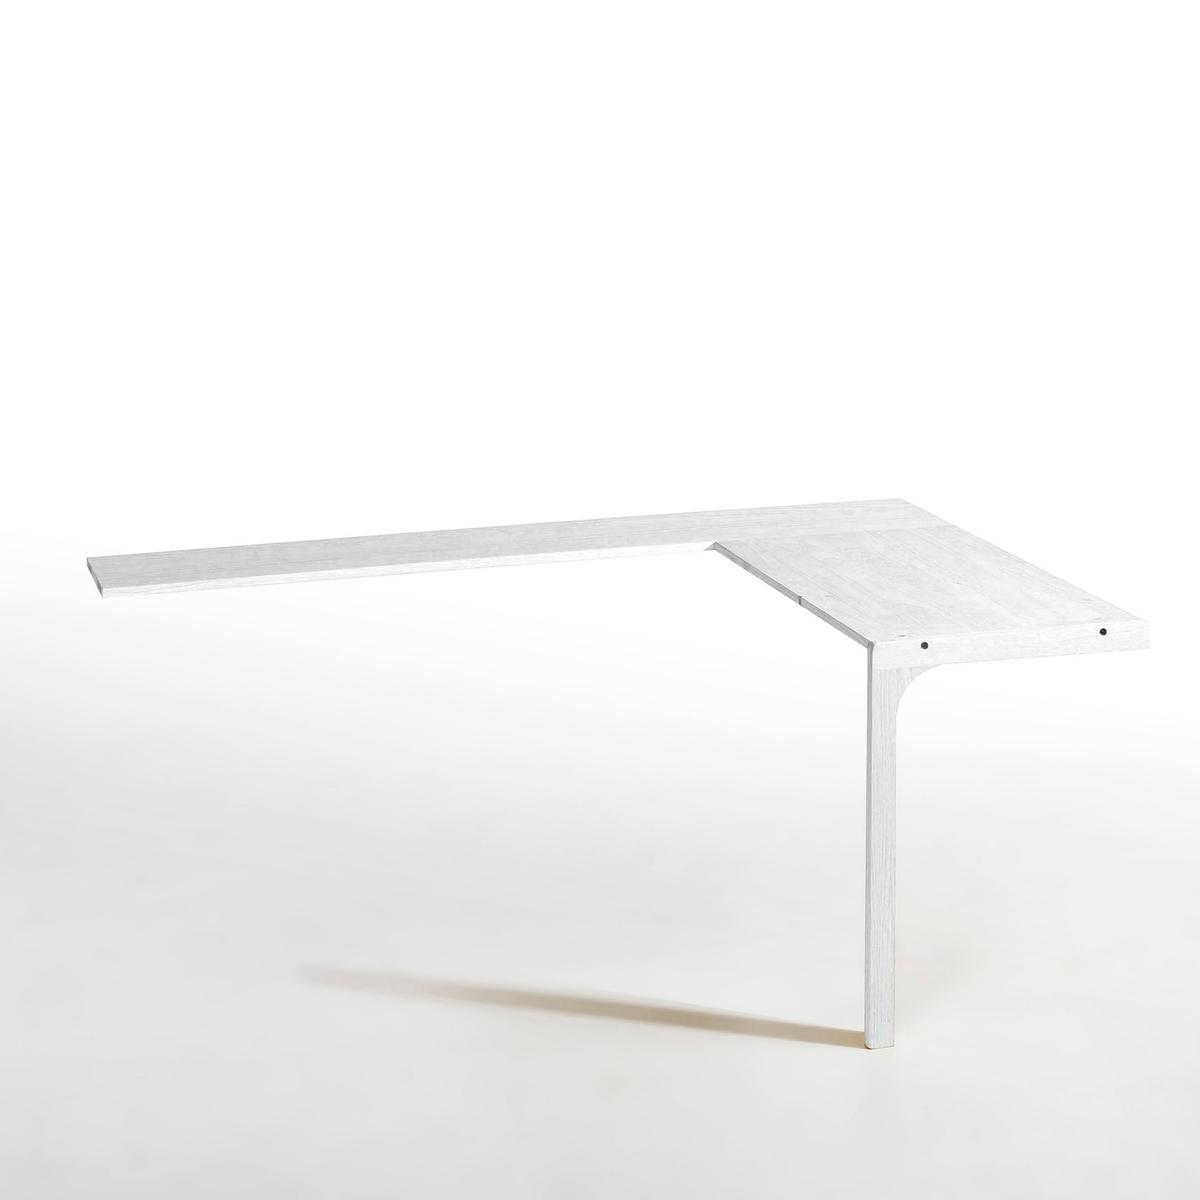 Письменный стол для кровати-чердака Duplex цена